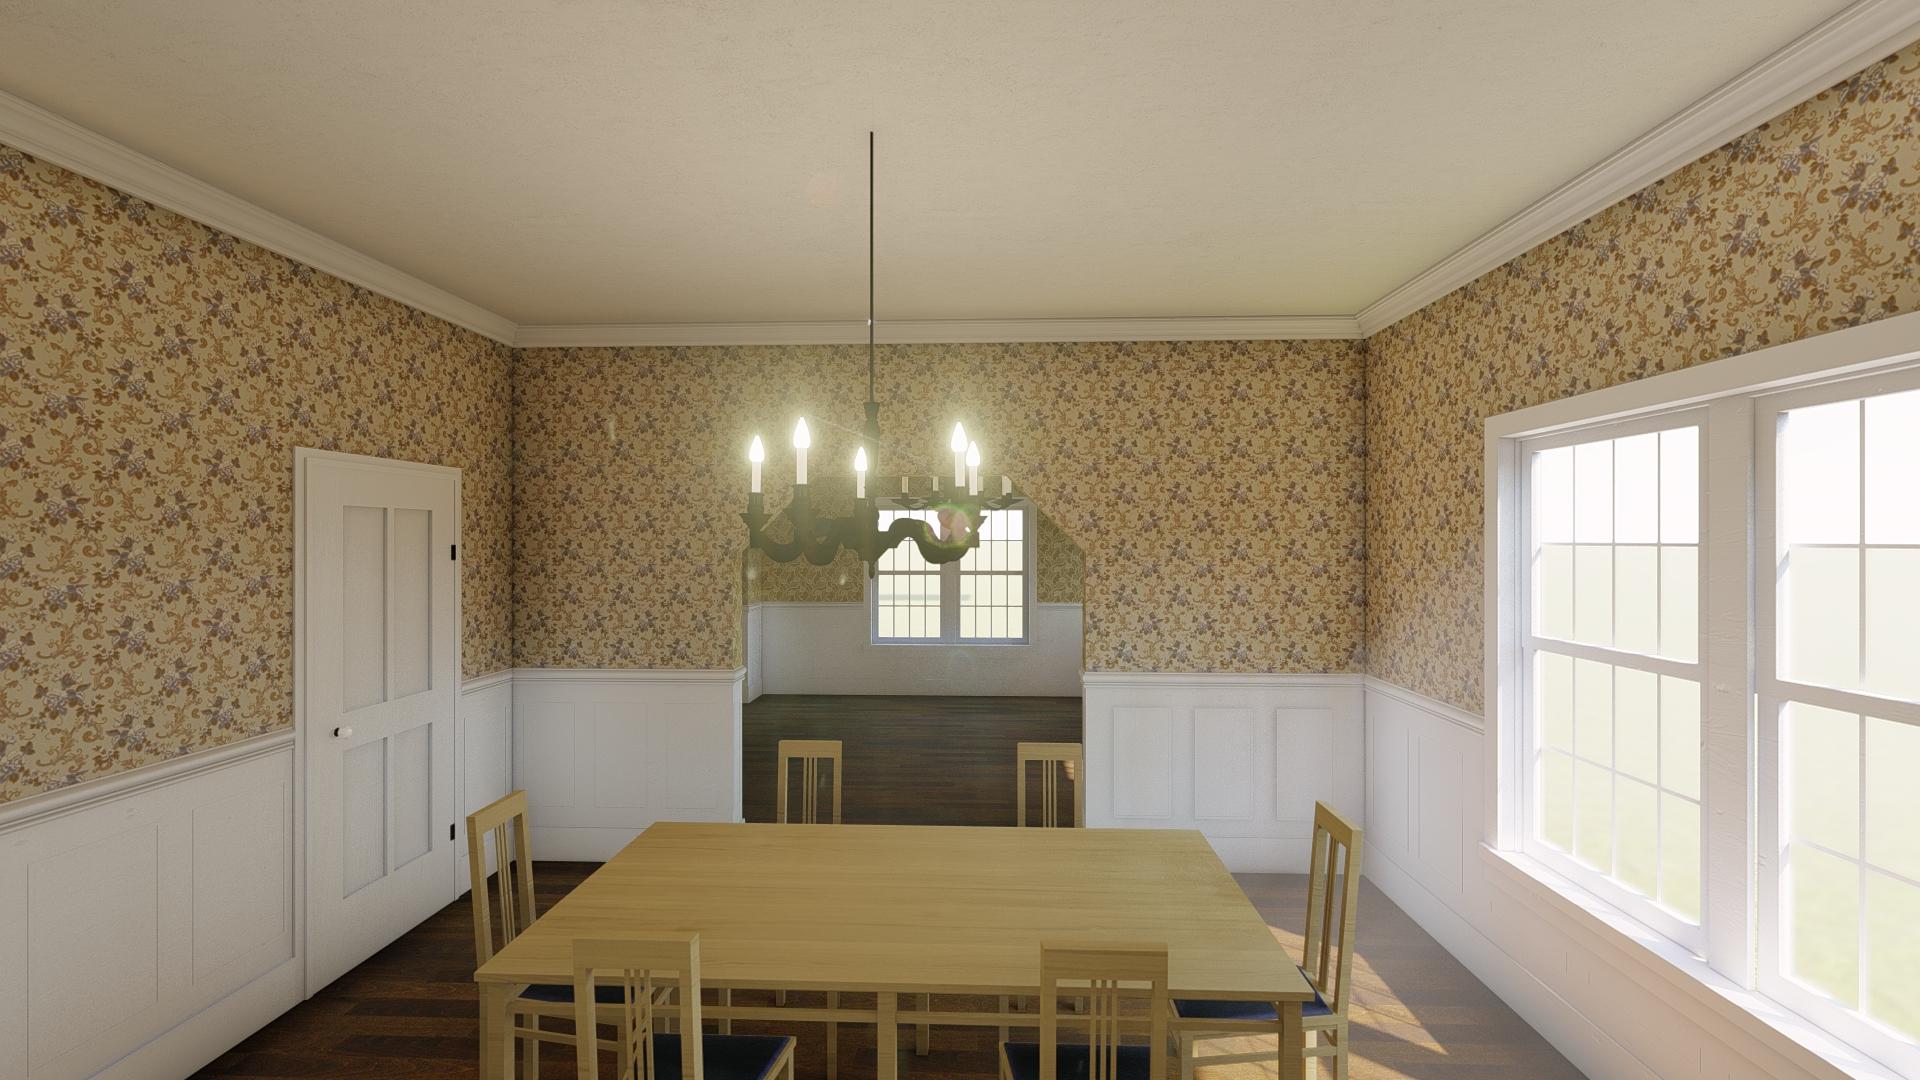 Chigley Interior_2 - Photo.jpg